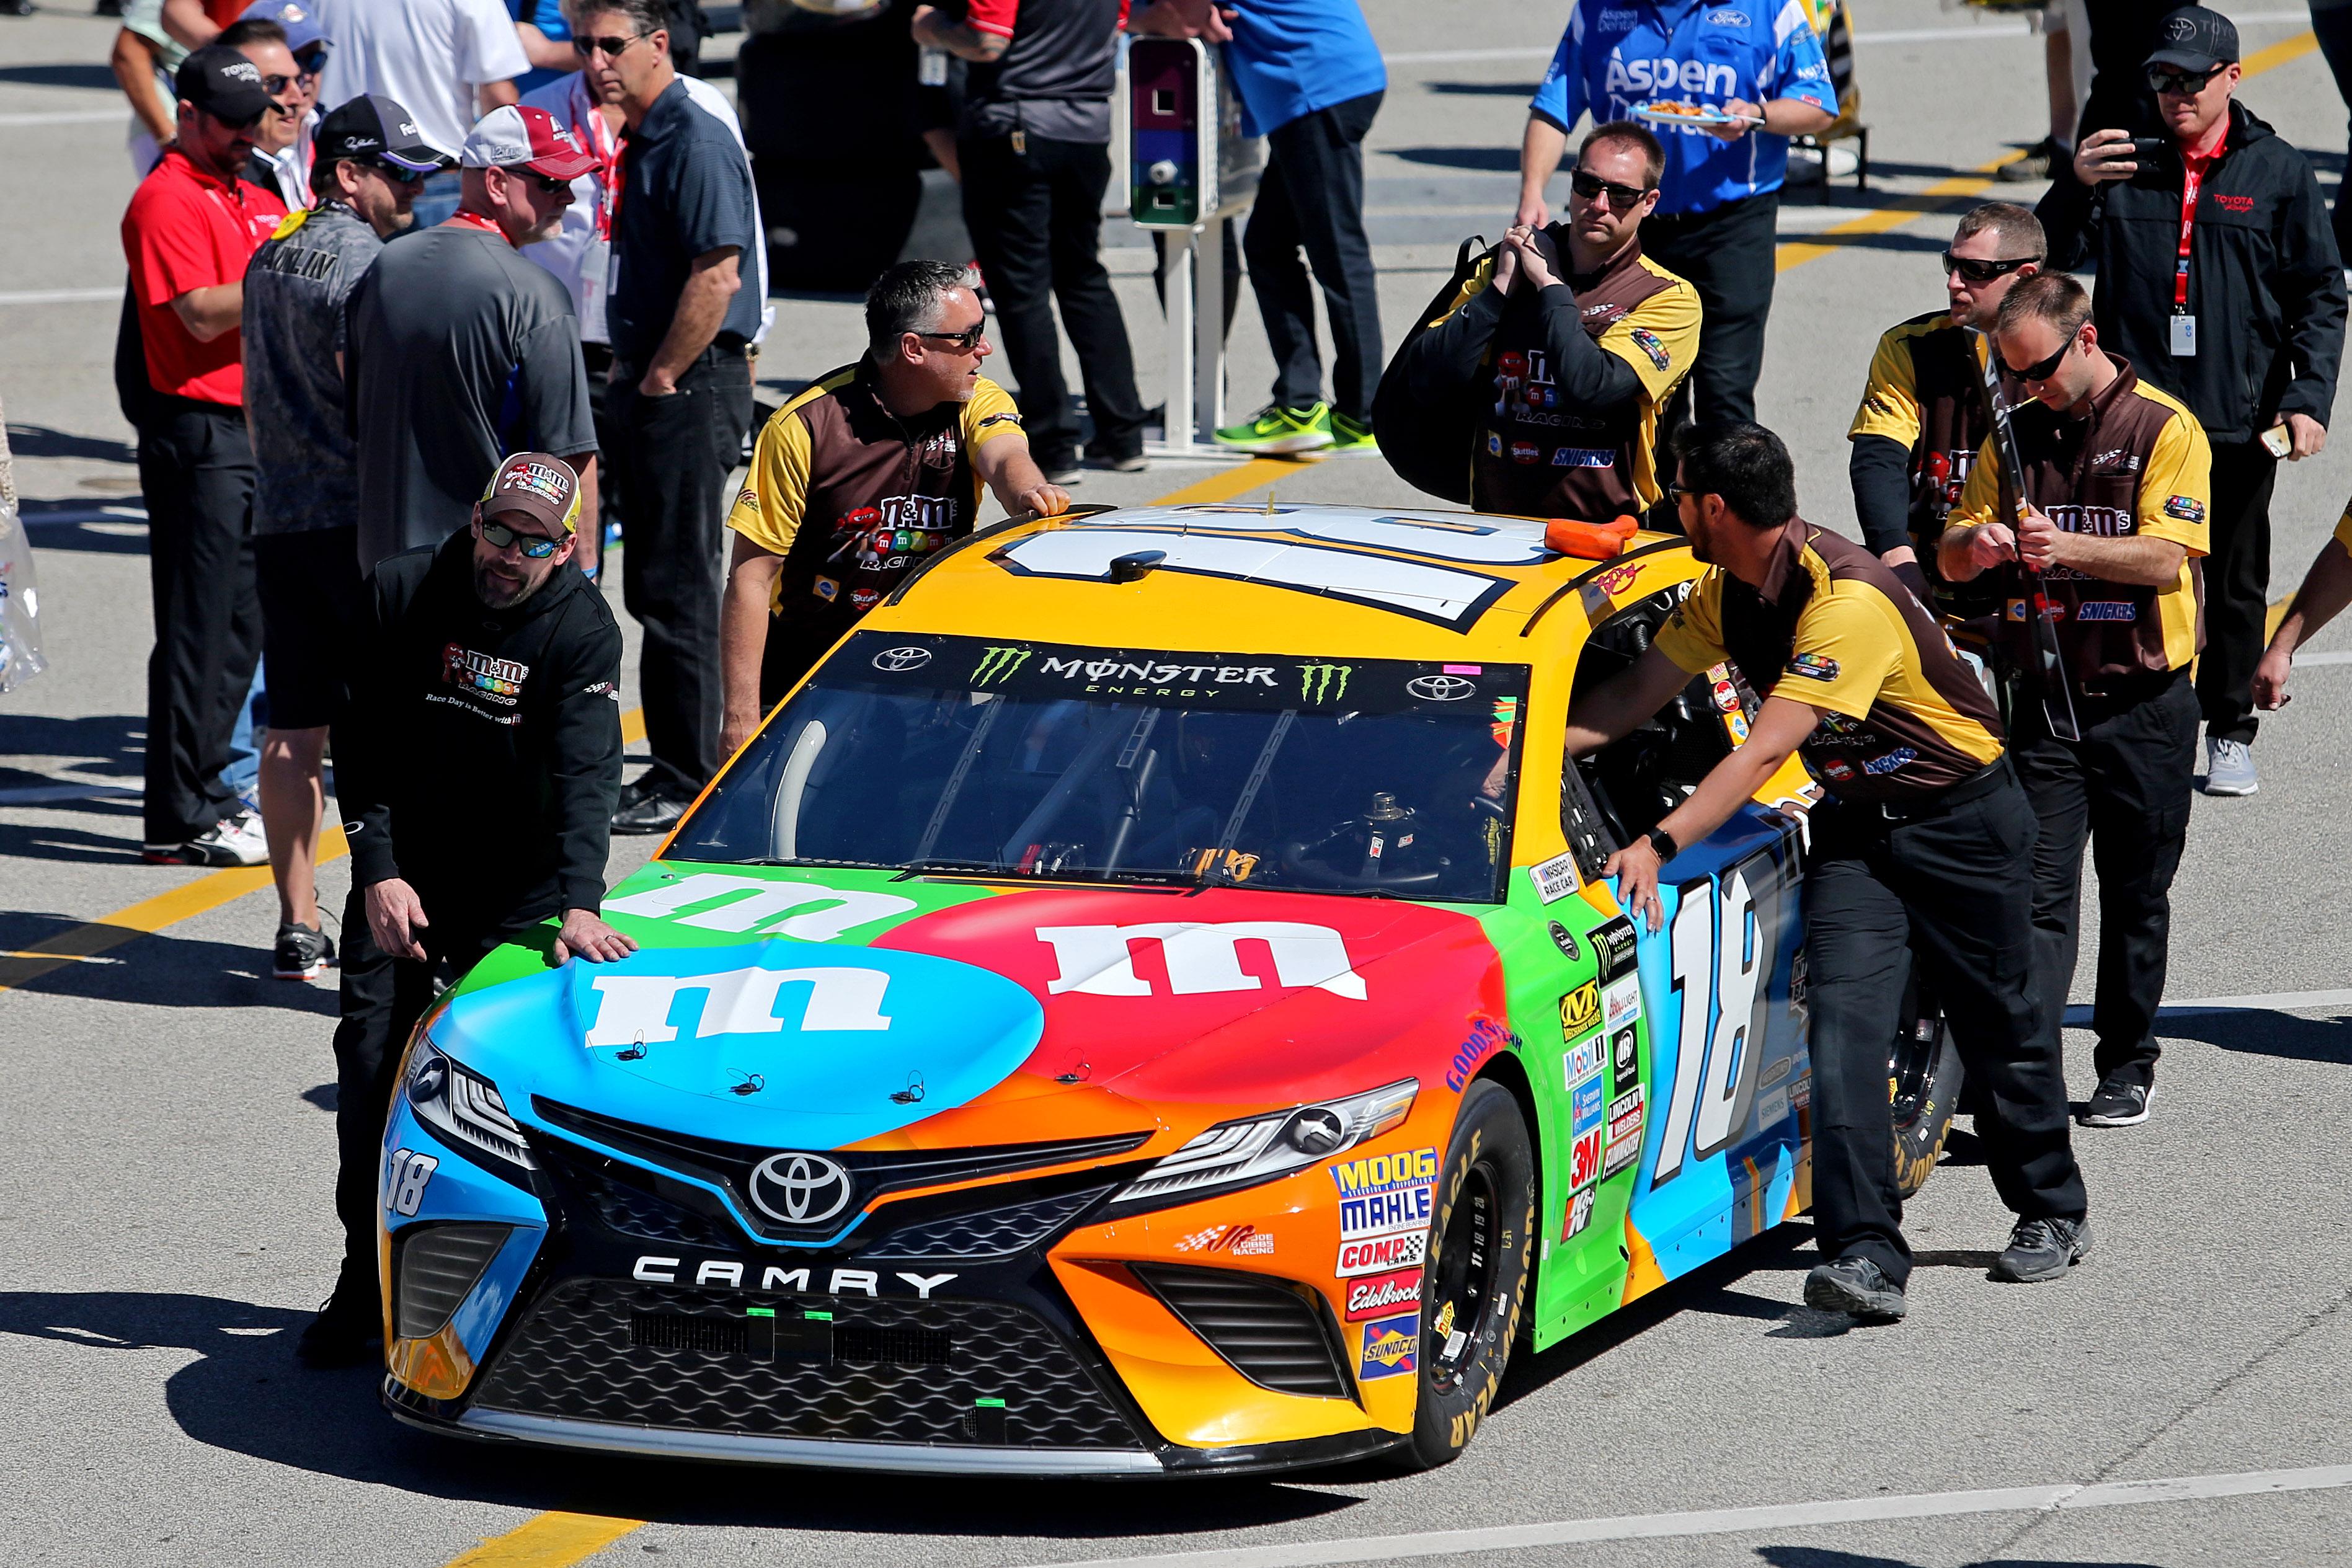 Kyle Busch Motorsports >> NASCAR: Mars Inc. Releases Statement On Kyle Busch Fight